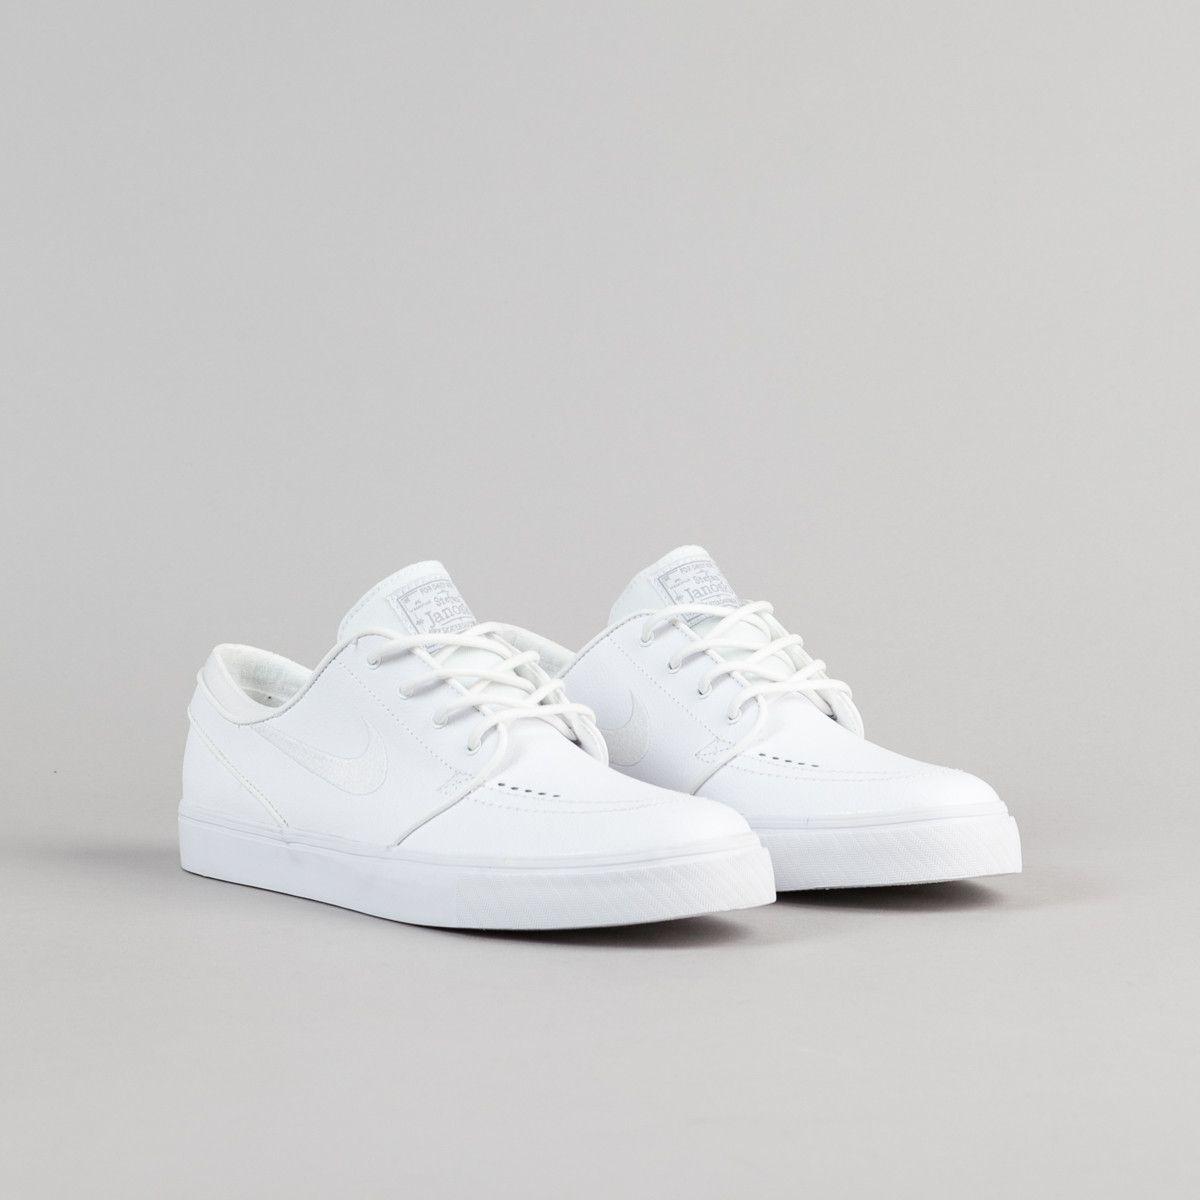 low priced 1b352 86125 Nike SB Stefan Janoski Leather Shoes - White   White - Wolf Grey